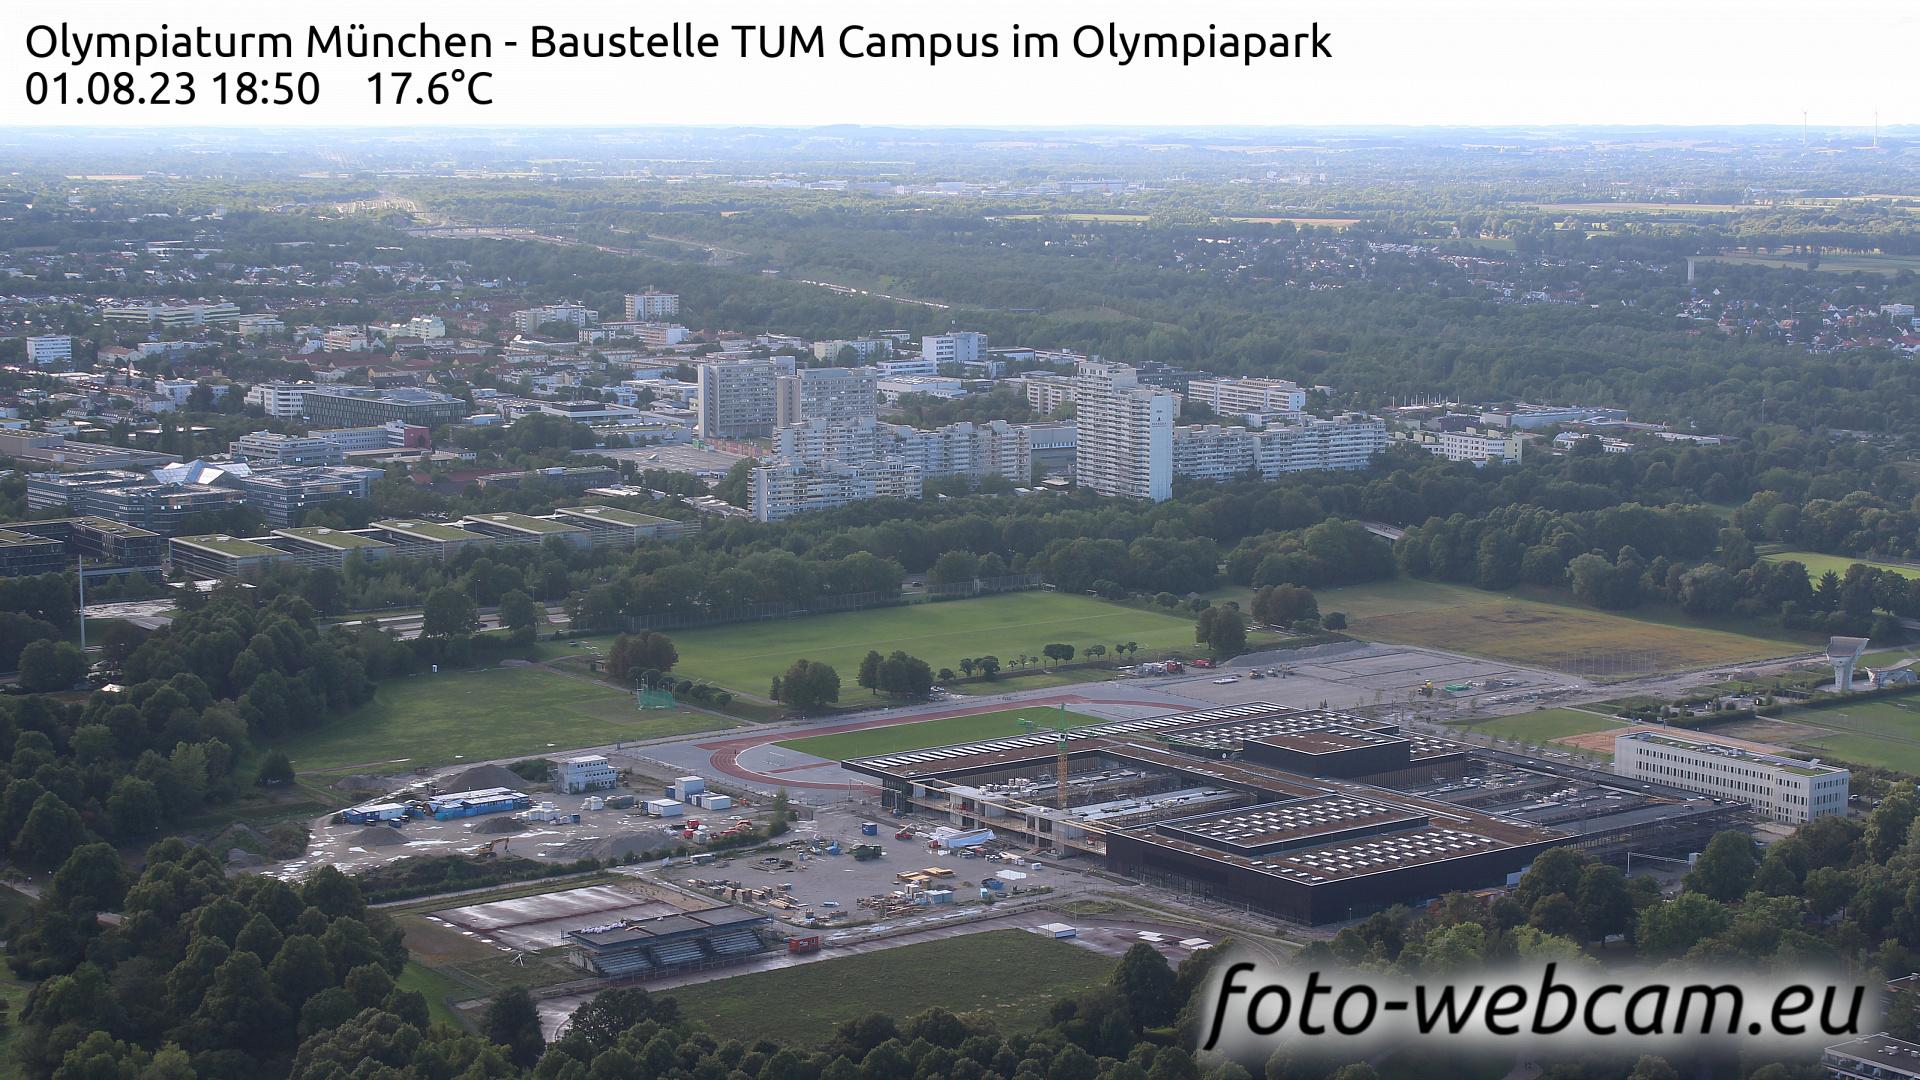 Munich Tue. 18:30